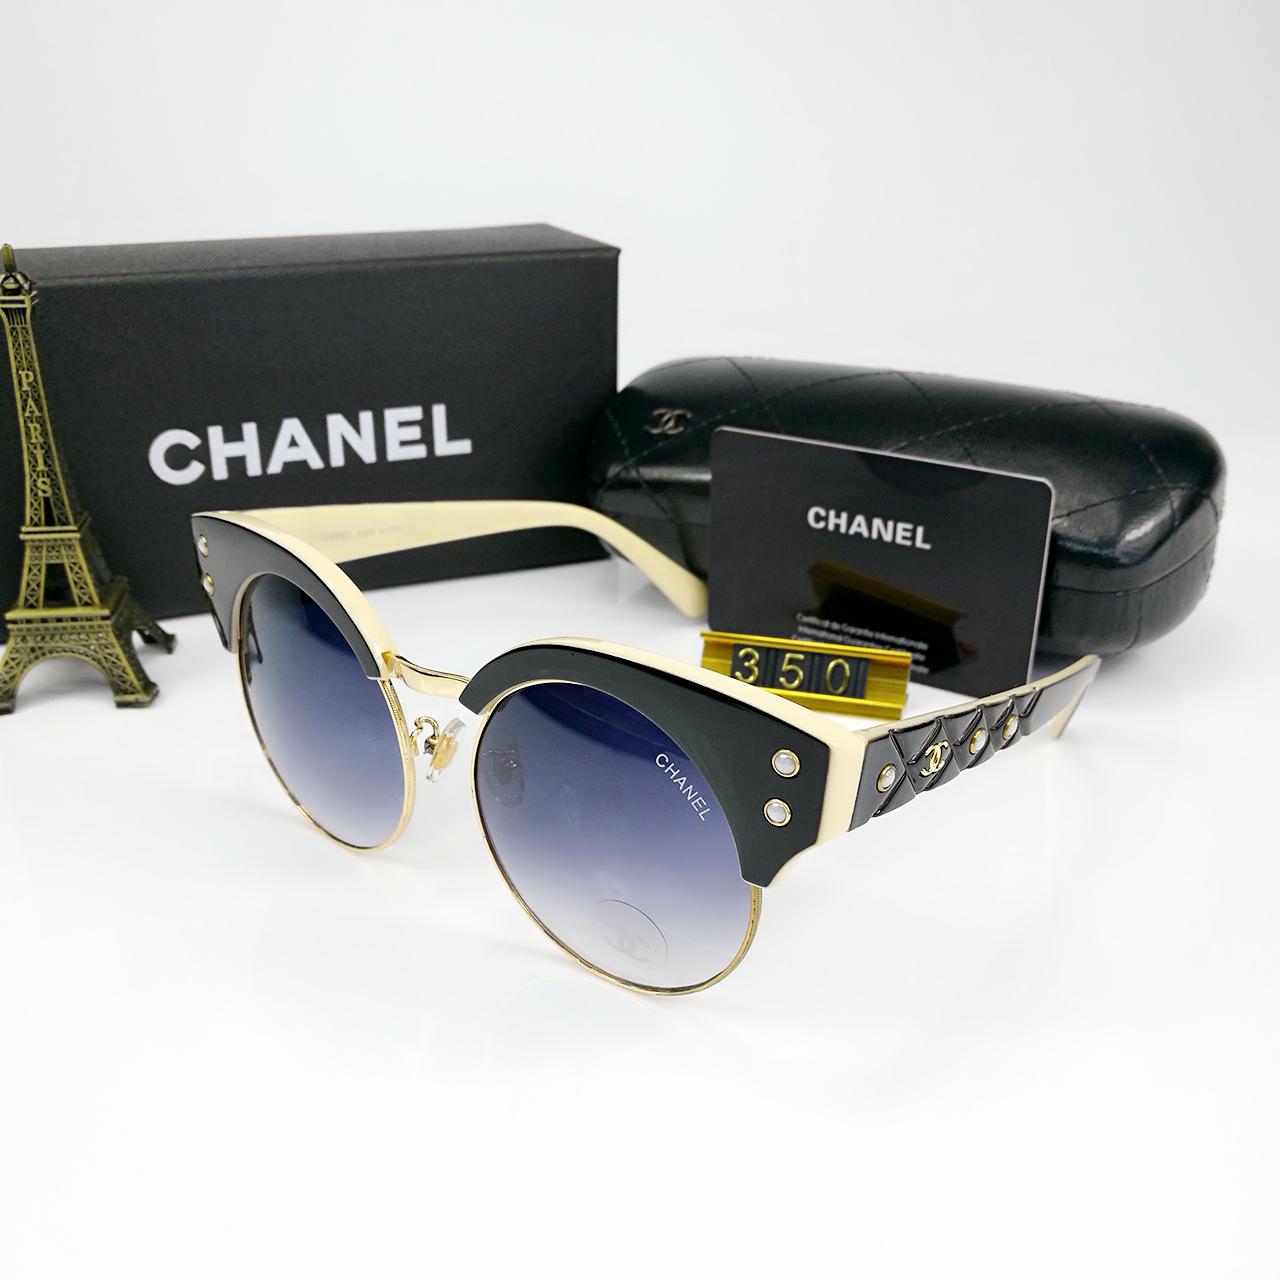 Cheap Sunglasses Chanel - Highgate Park